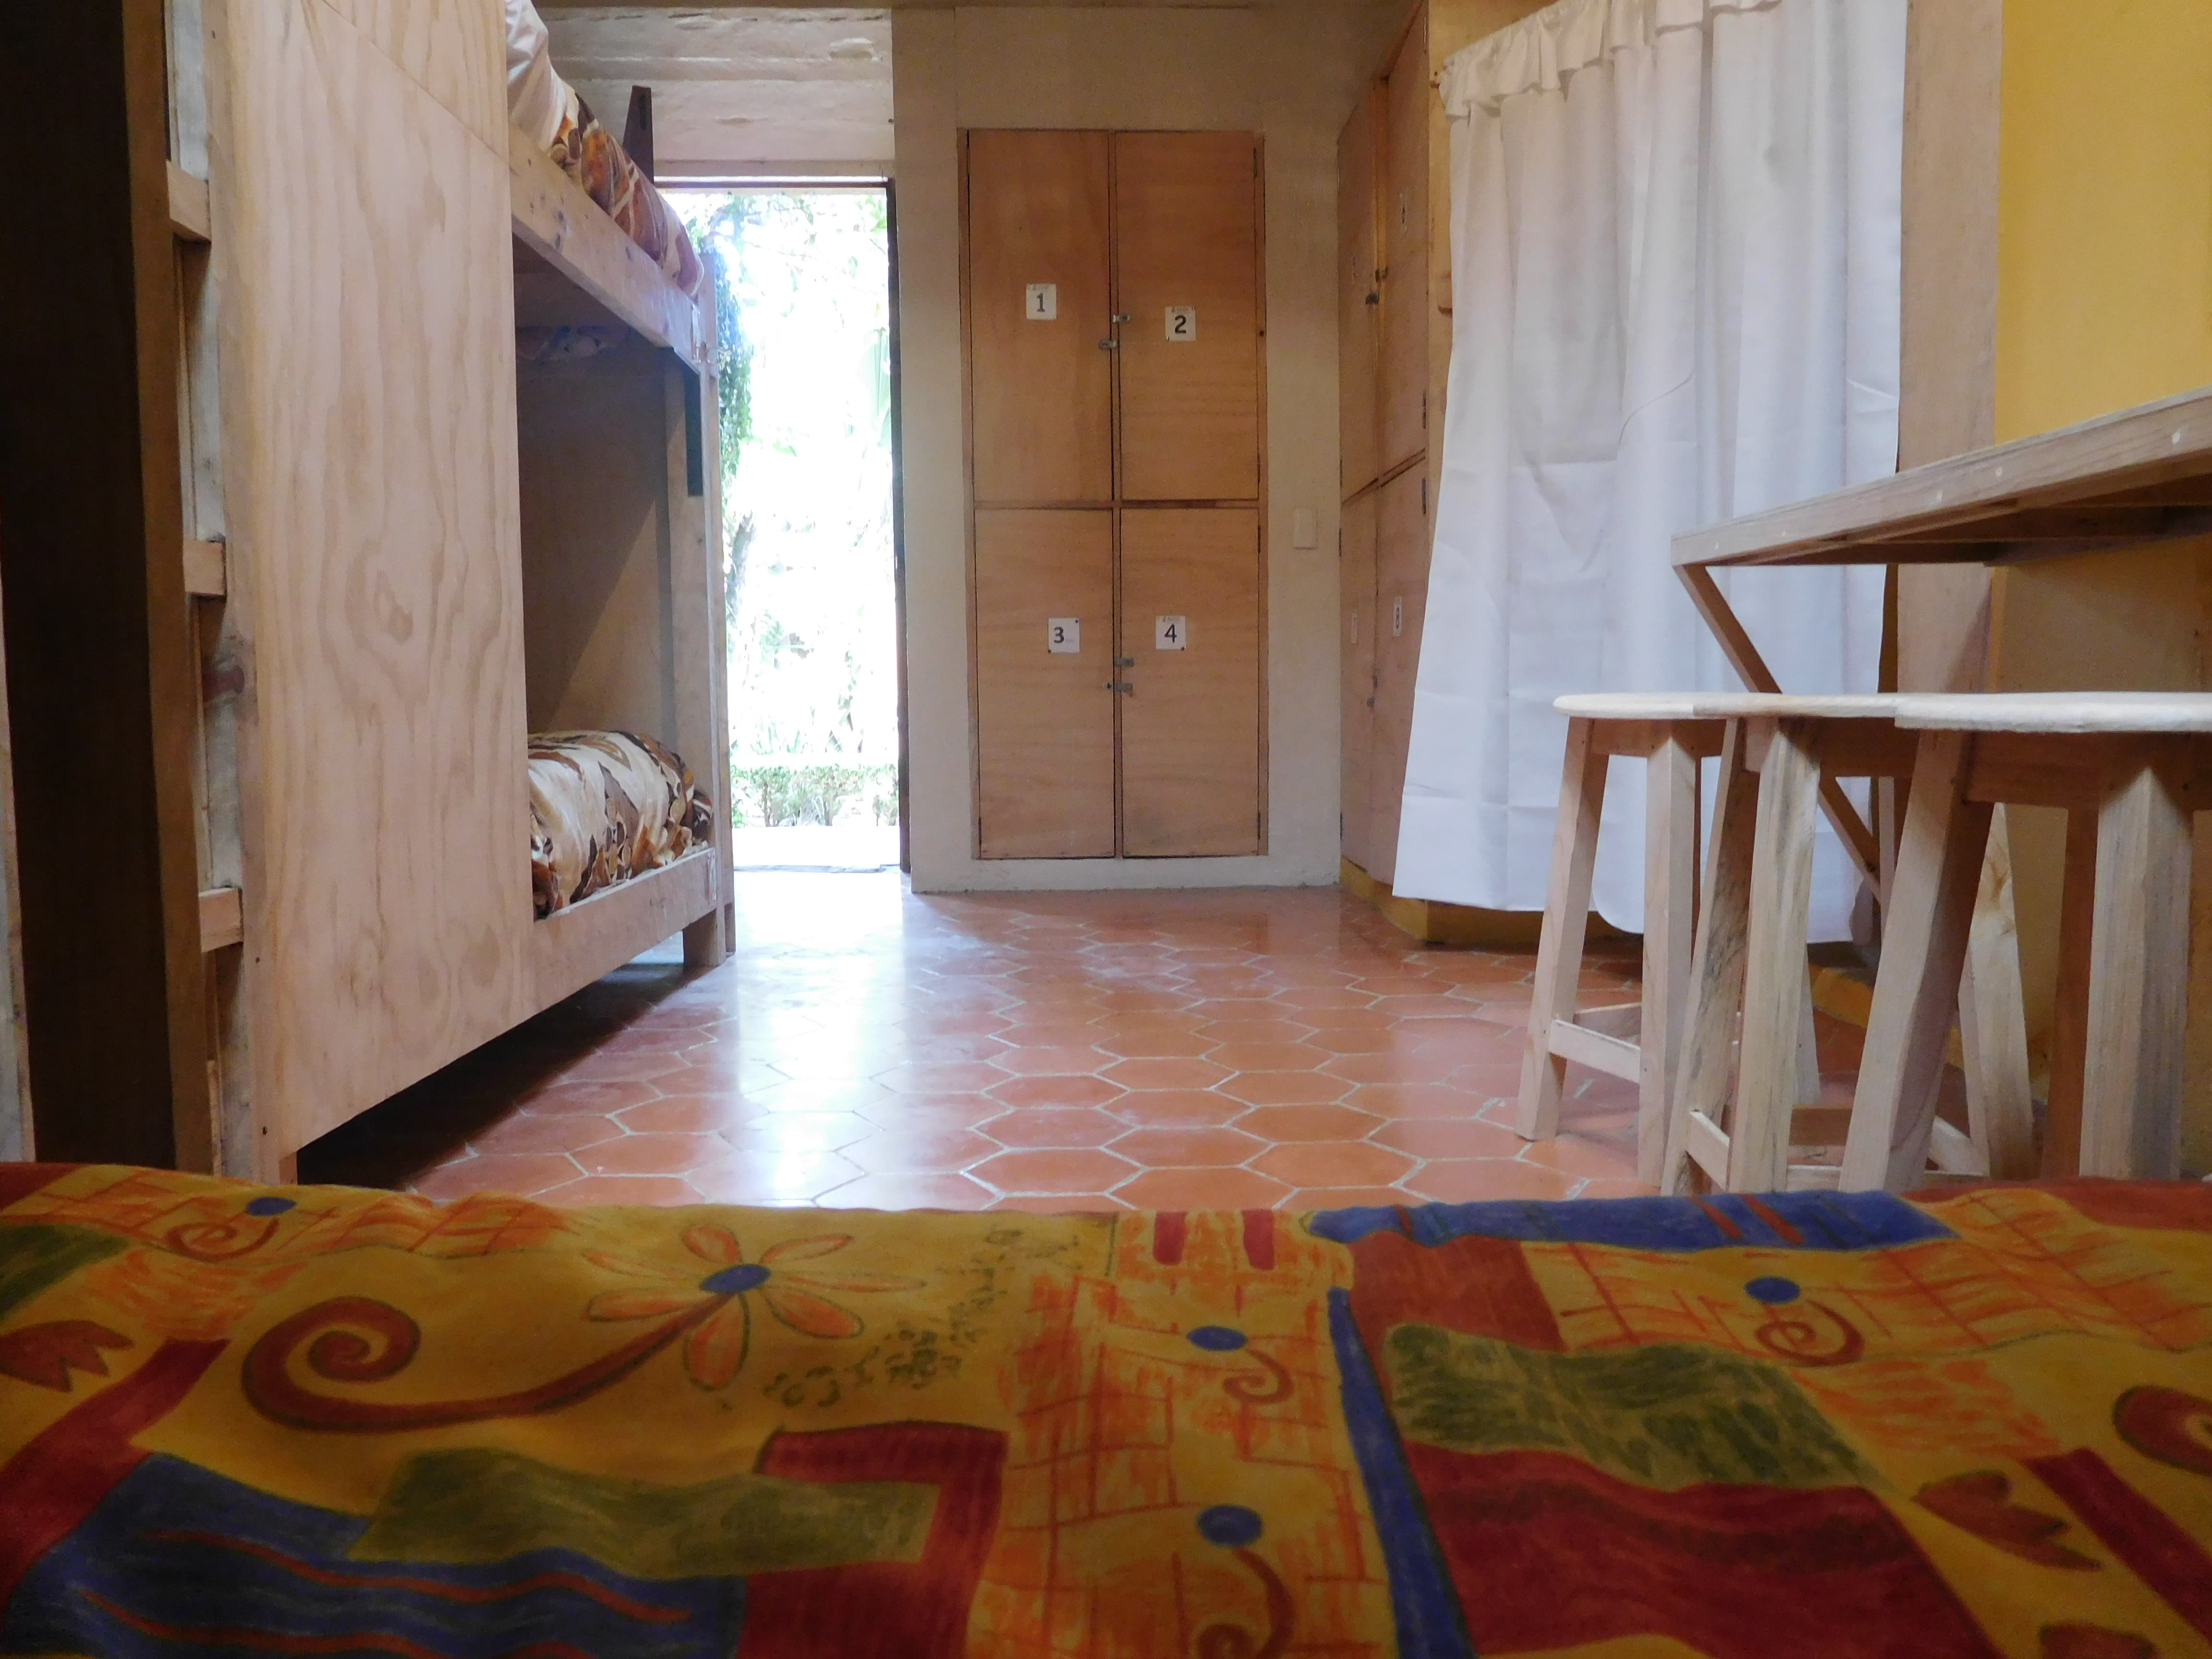 HOSTEL - Rossco Backpackers Hostel